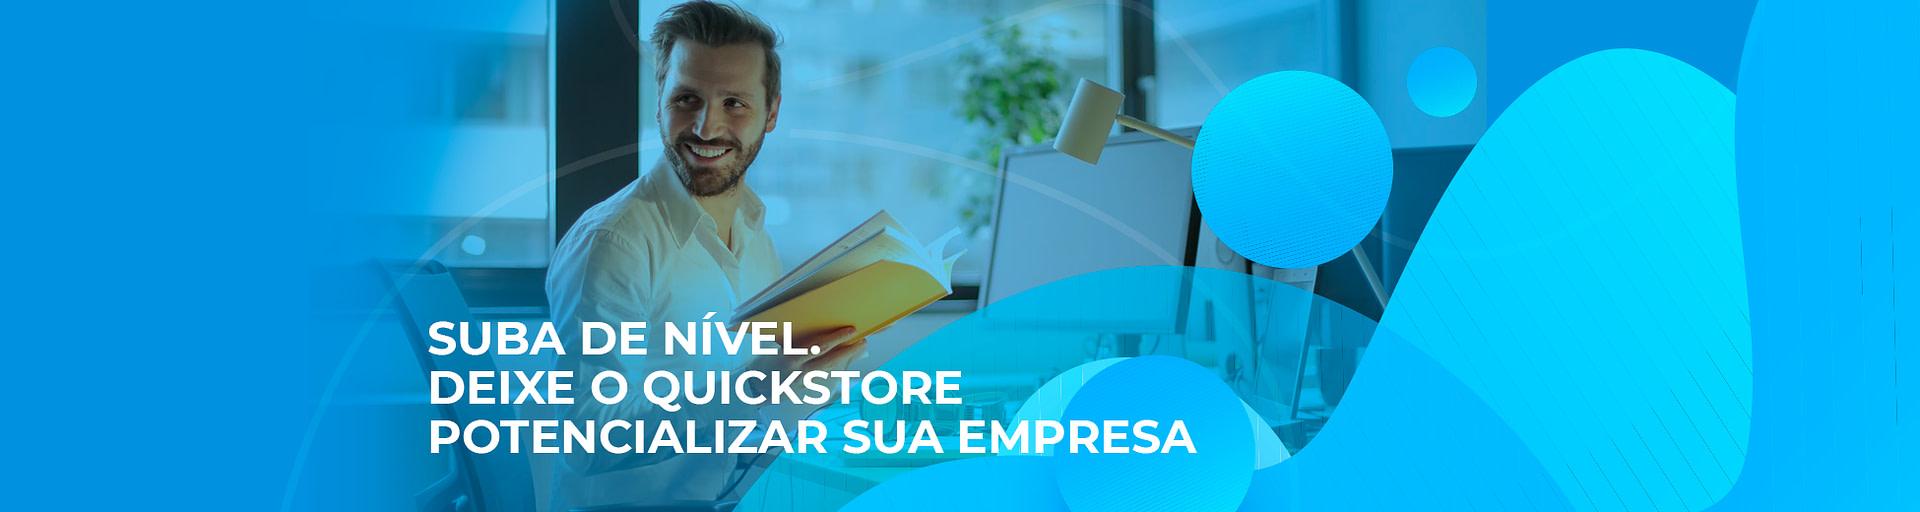 Suba de nível, deixe a QuickStore potencializar sua empresa